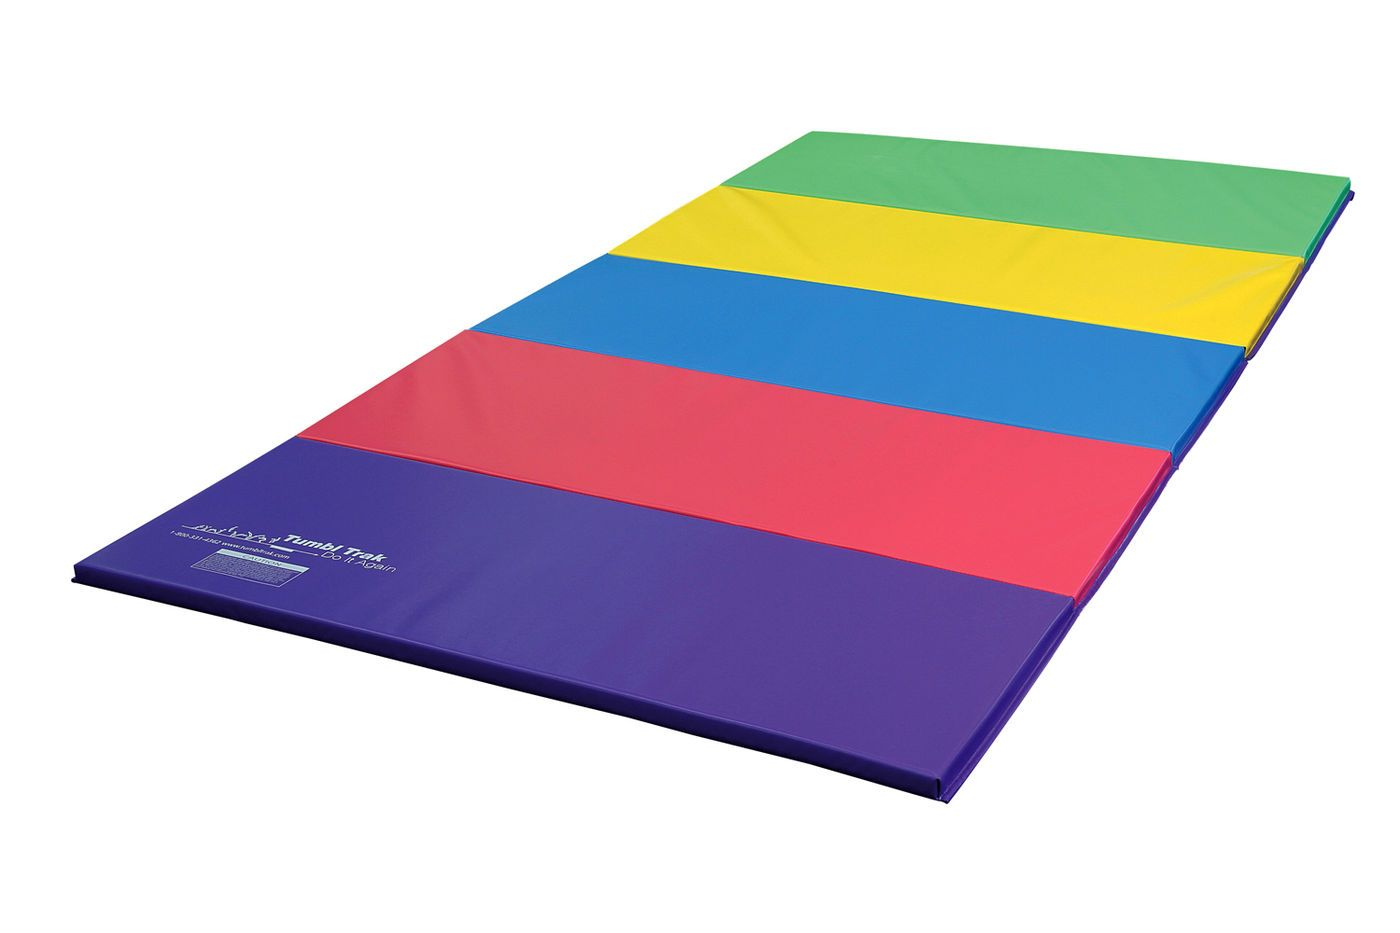 Tumbling Mats Tumbling Foam Vinyl Panel Velcro Mats